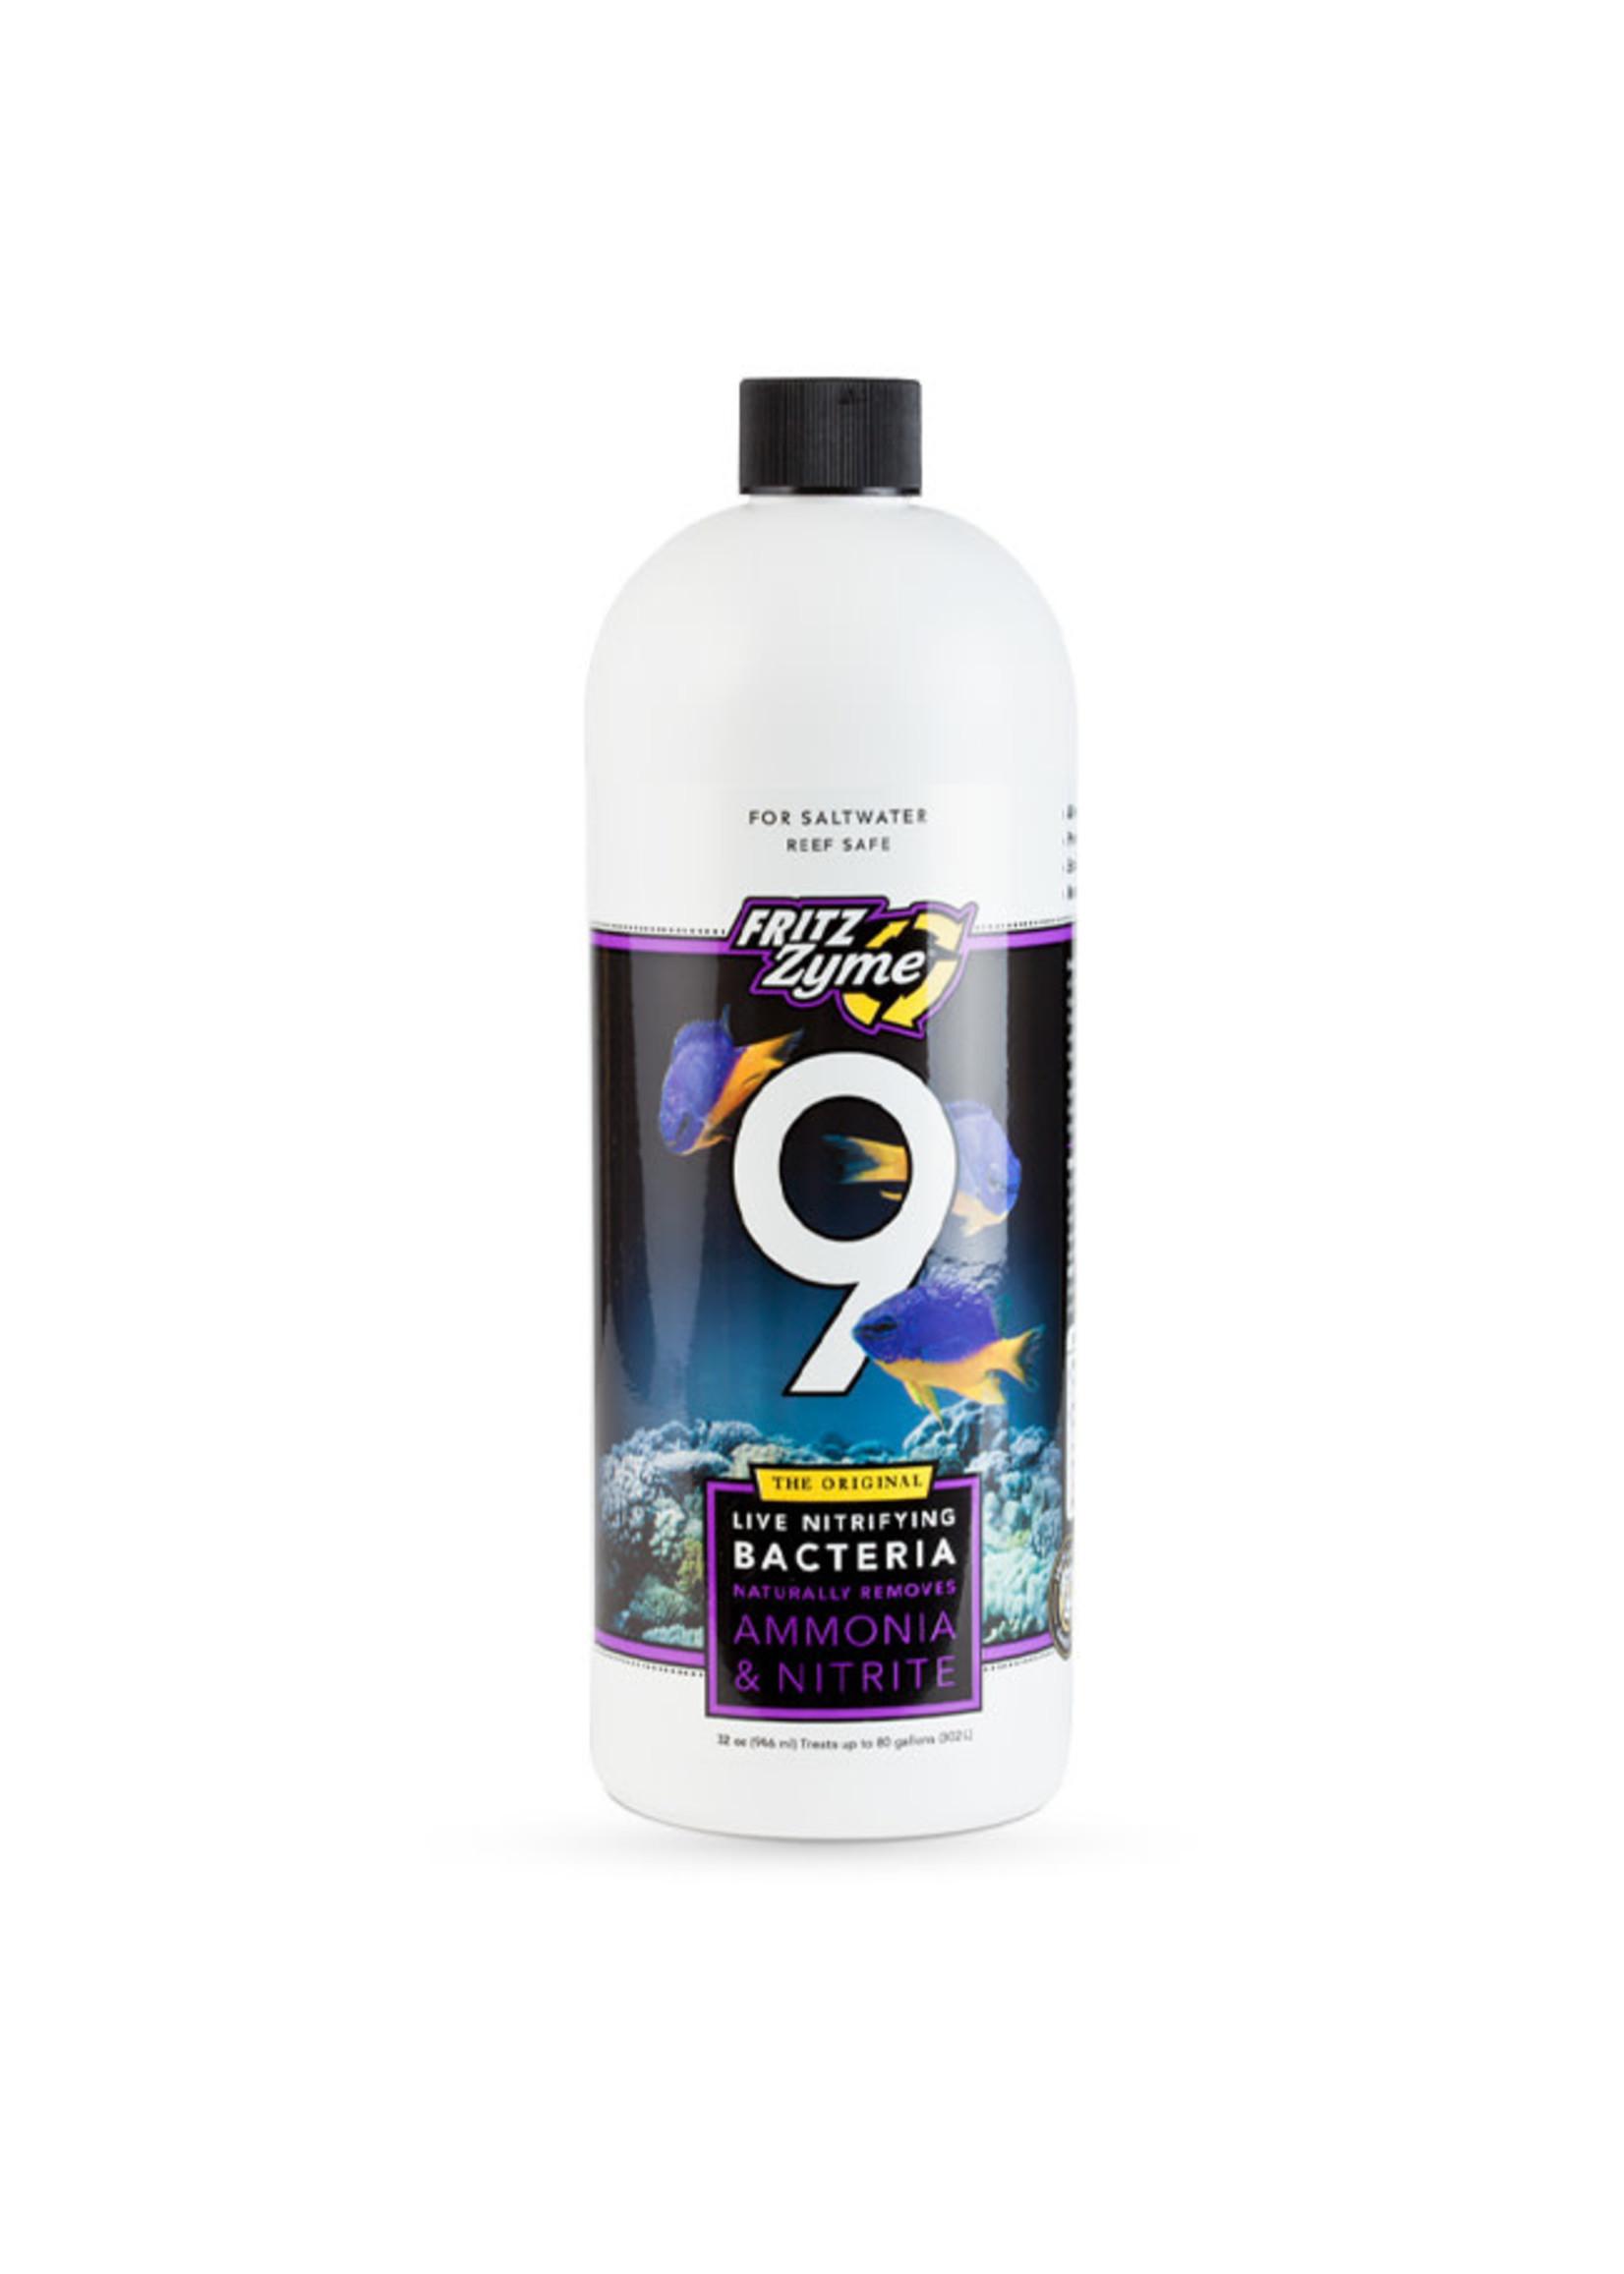 Fritz Aquatics Fritz Zyme 9 Saltwater Live Nitrifying Bacteria